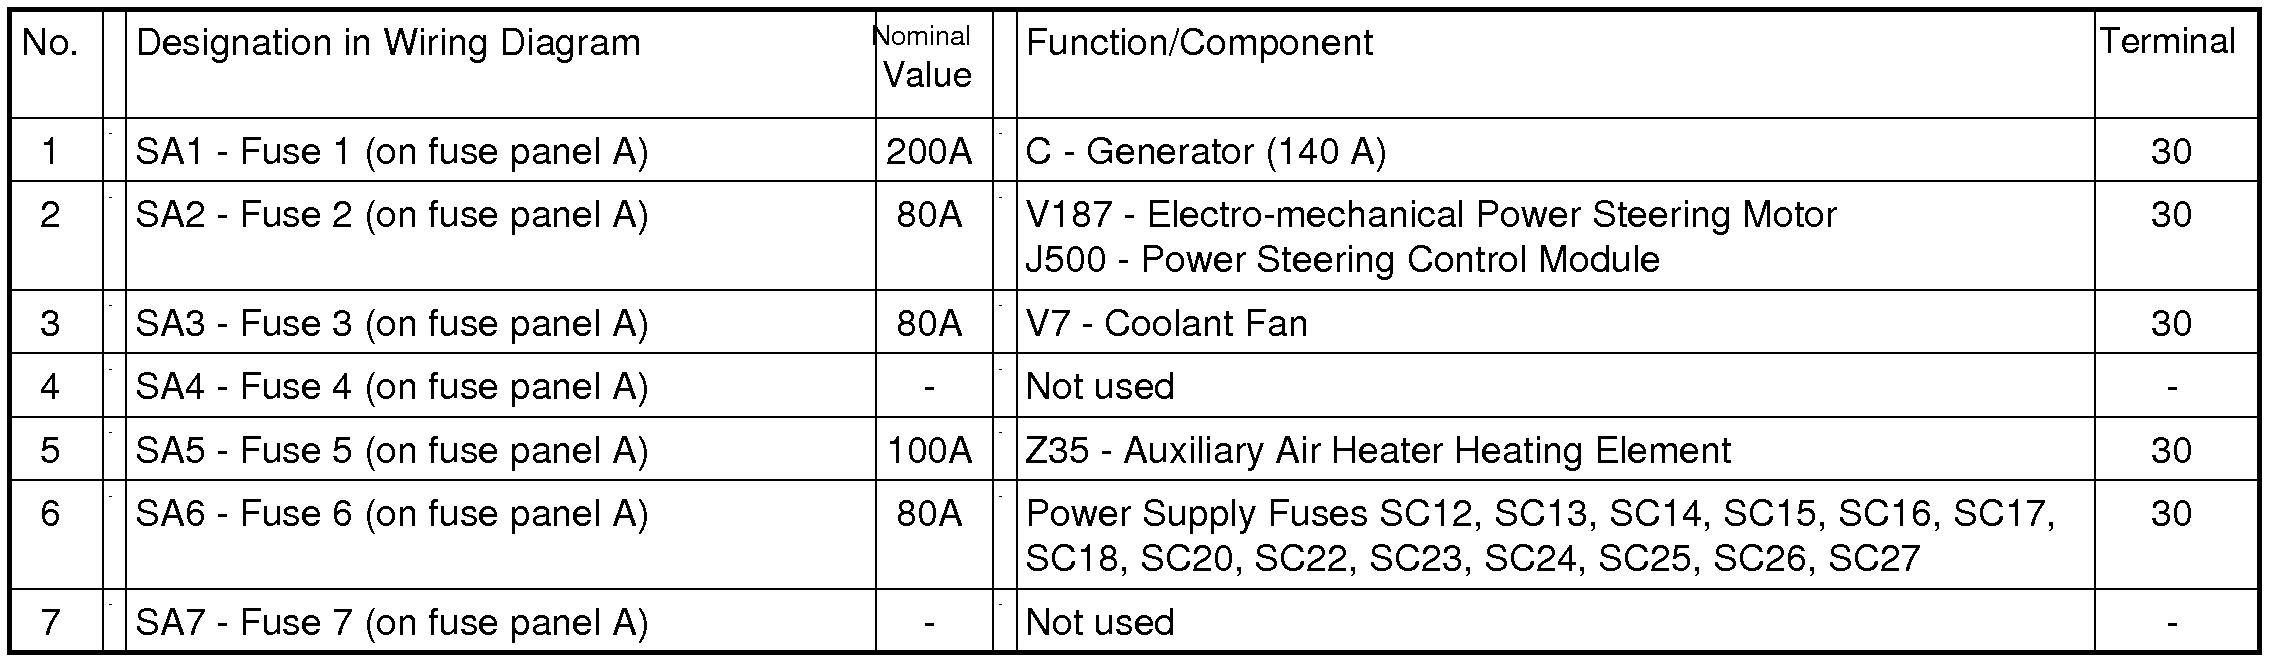 Vw Jetta Fuse Box Diagram On Electrical Wiring Diagram Symbol Legend